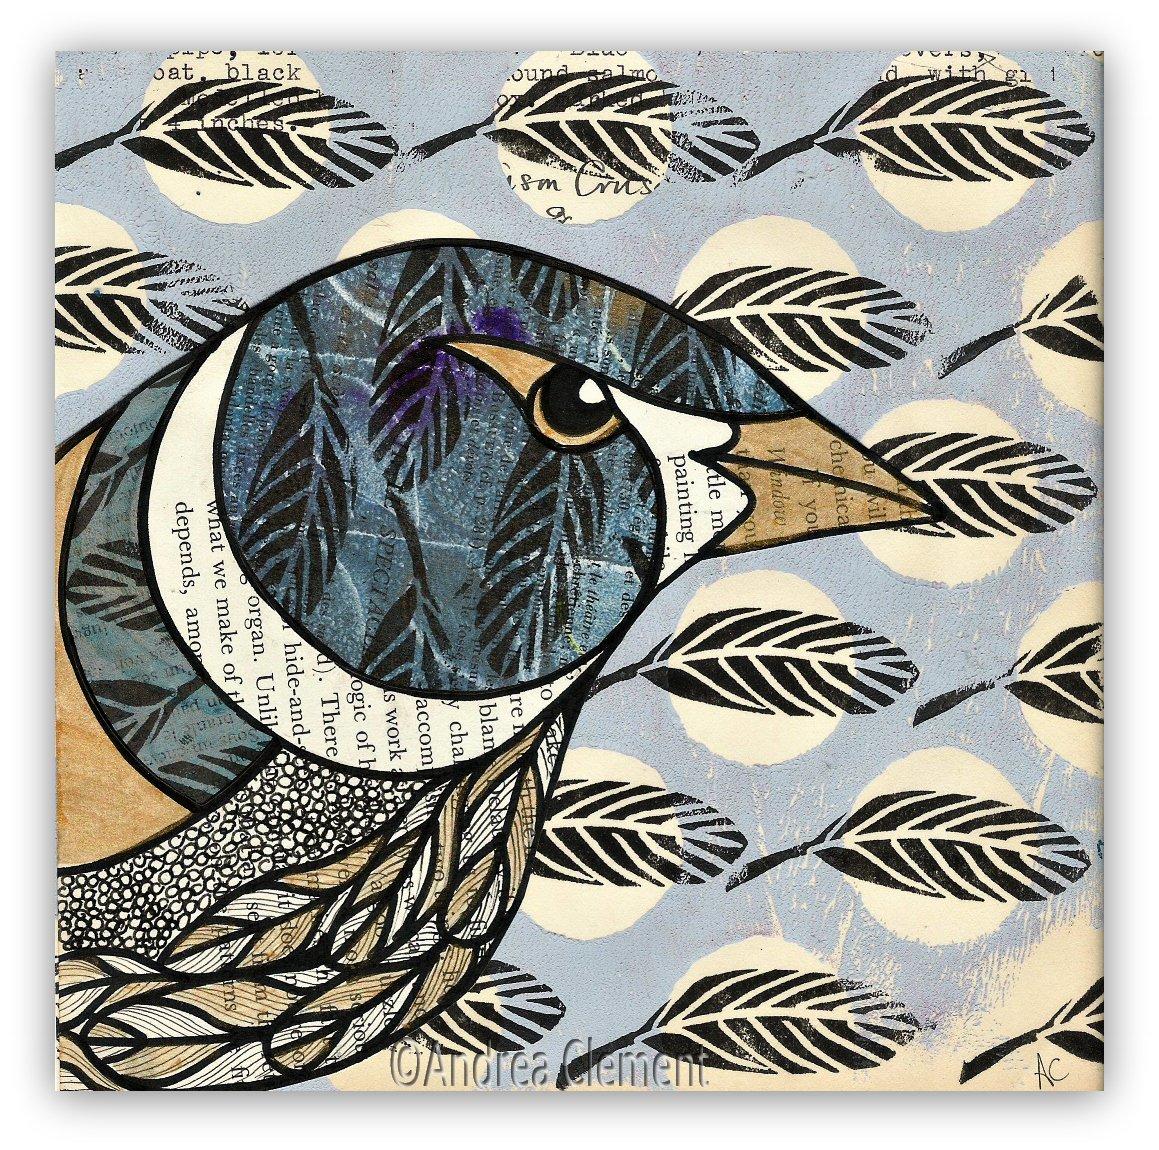 A little birdie... #bird #mixedmedia #birdportrait #portraitnovember #pattern #collage #mixedmediaart #decorativebird<br>http://pic.twitter.com/6tkHI8ZfEI